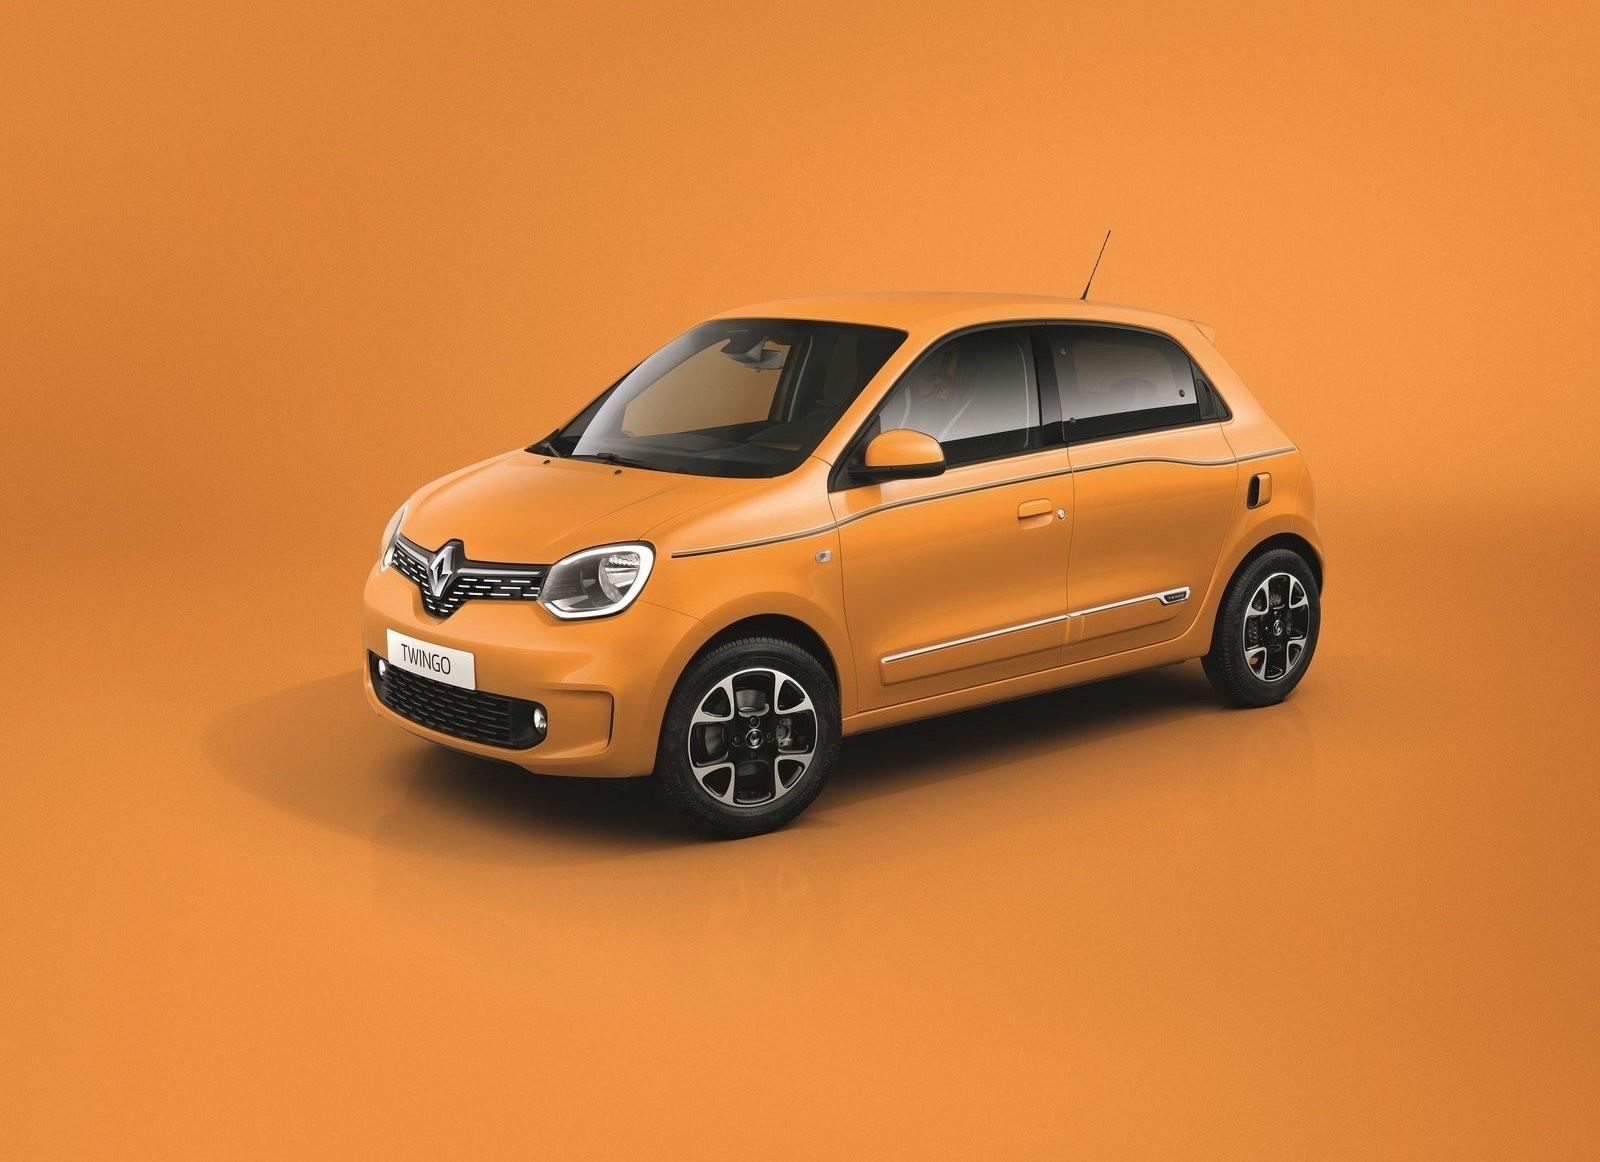 Foto de Renault Twingo 2020 (16/20)